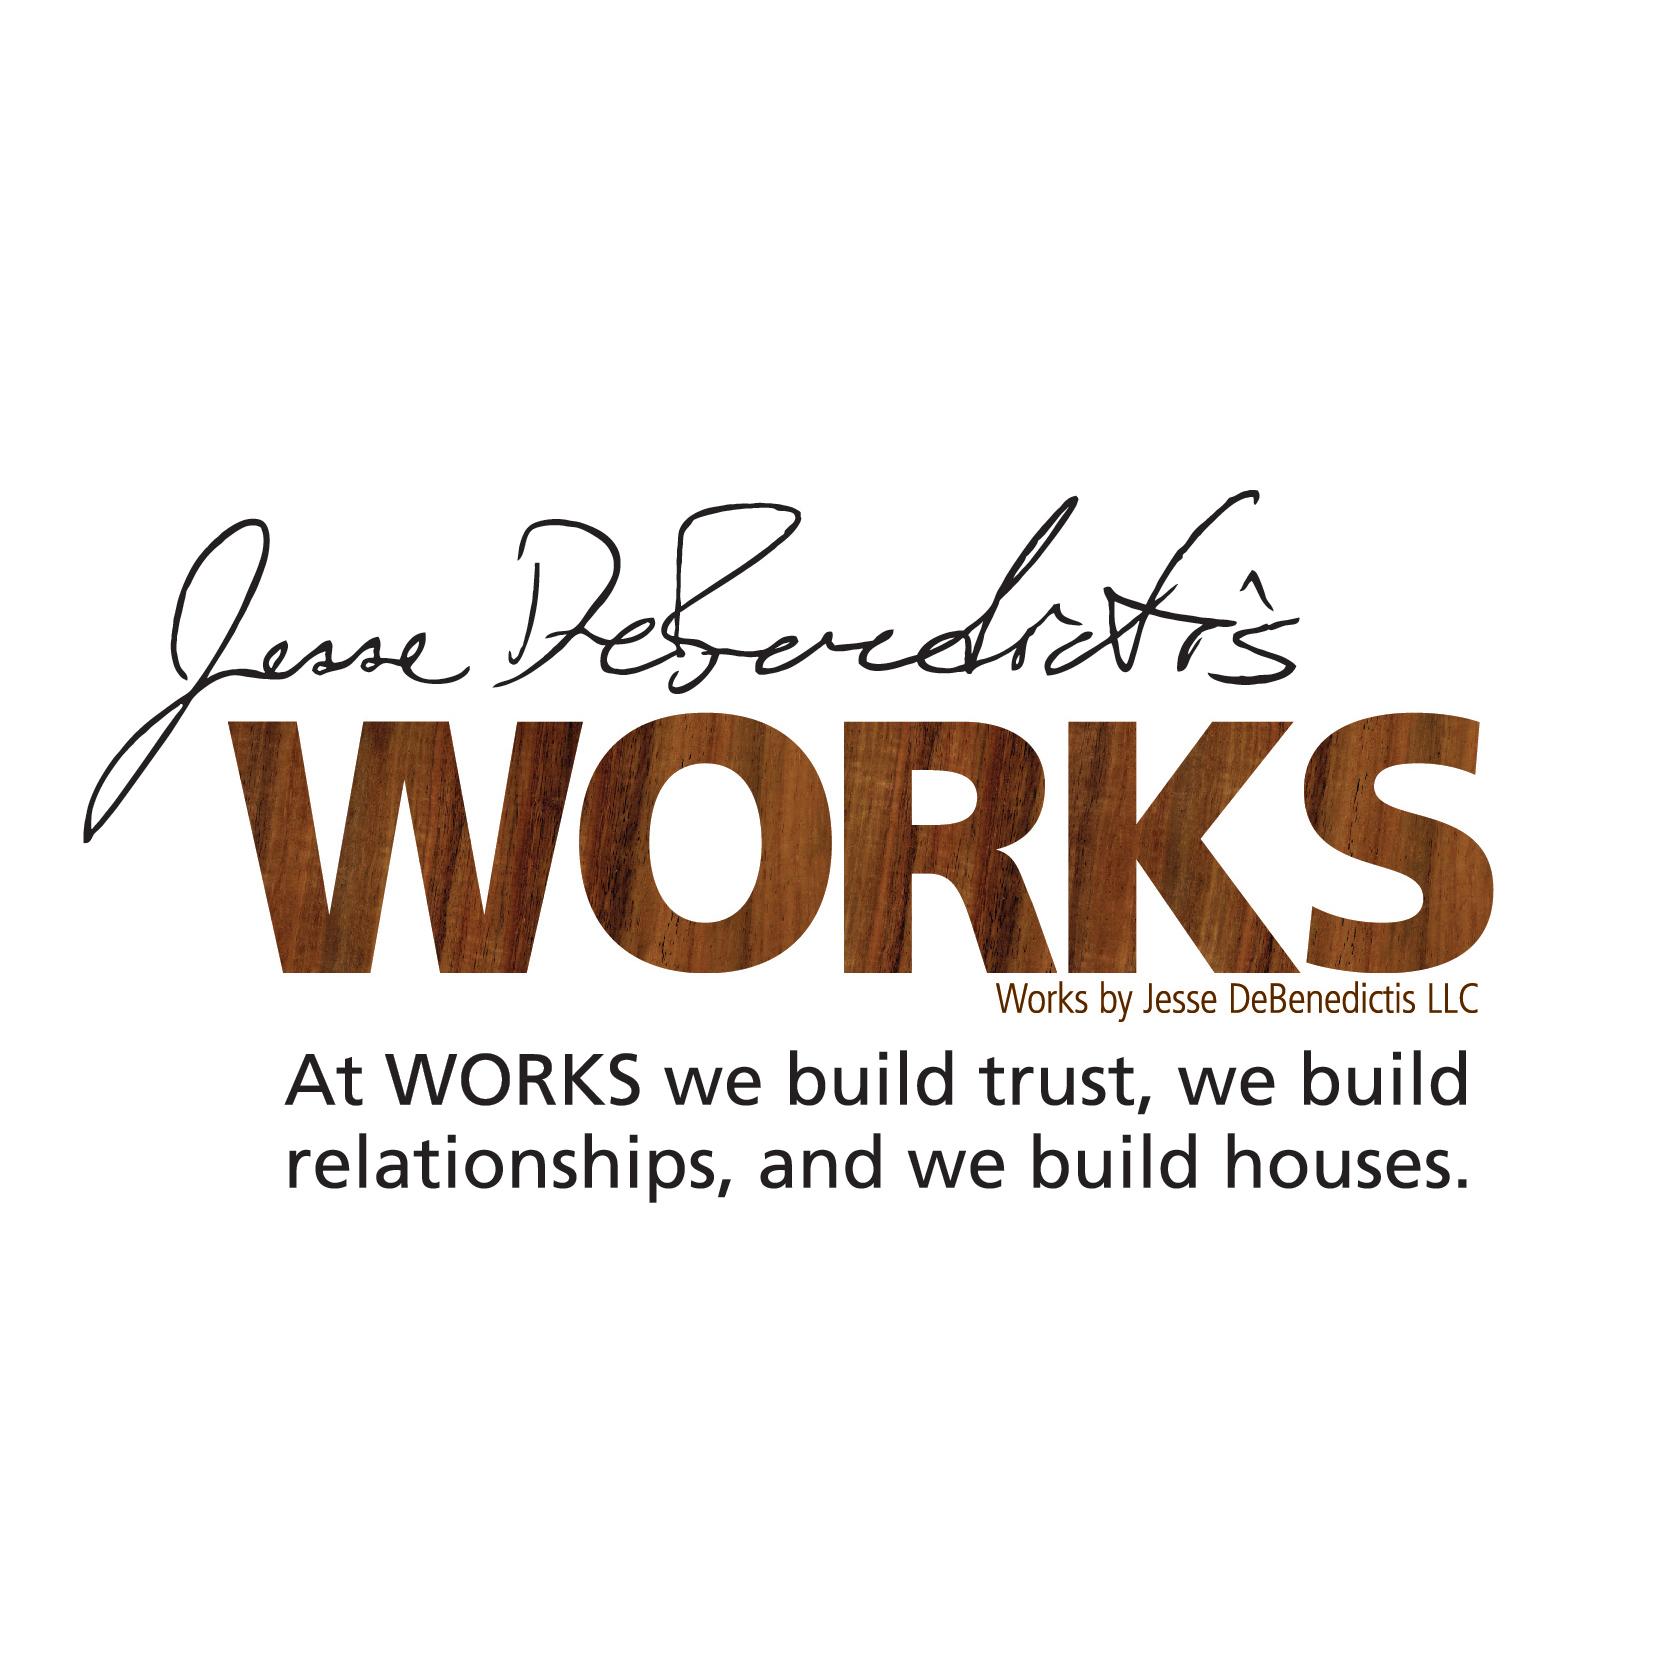 WORKS by Jesse DeBenedictis